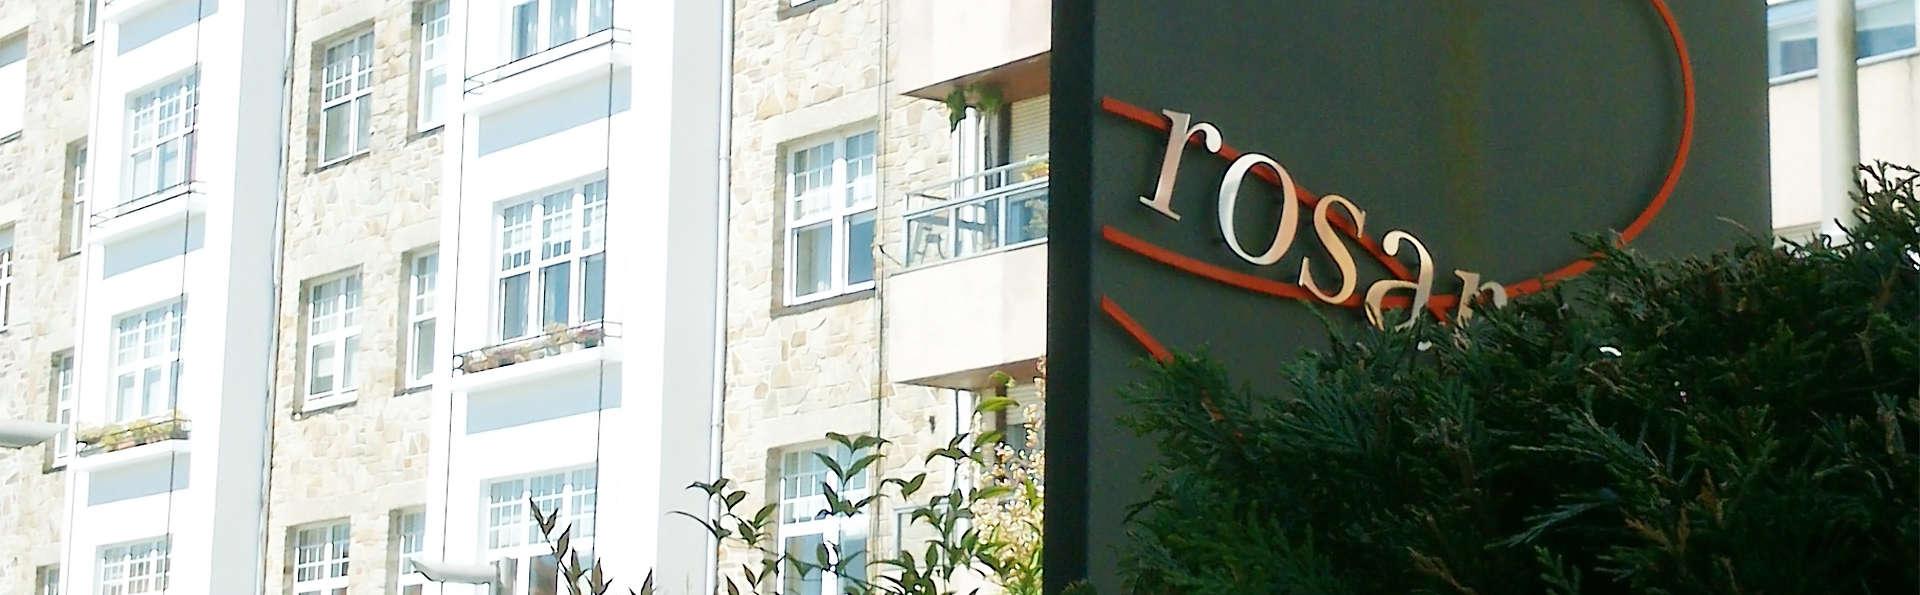 Rosa Rosae PR - EDIT_ext2.jpg